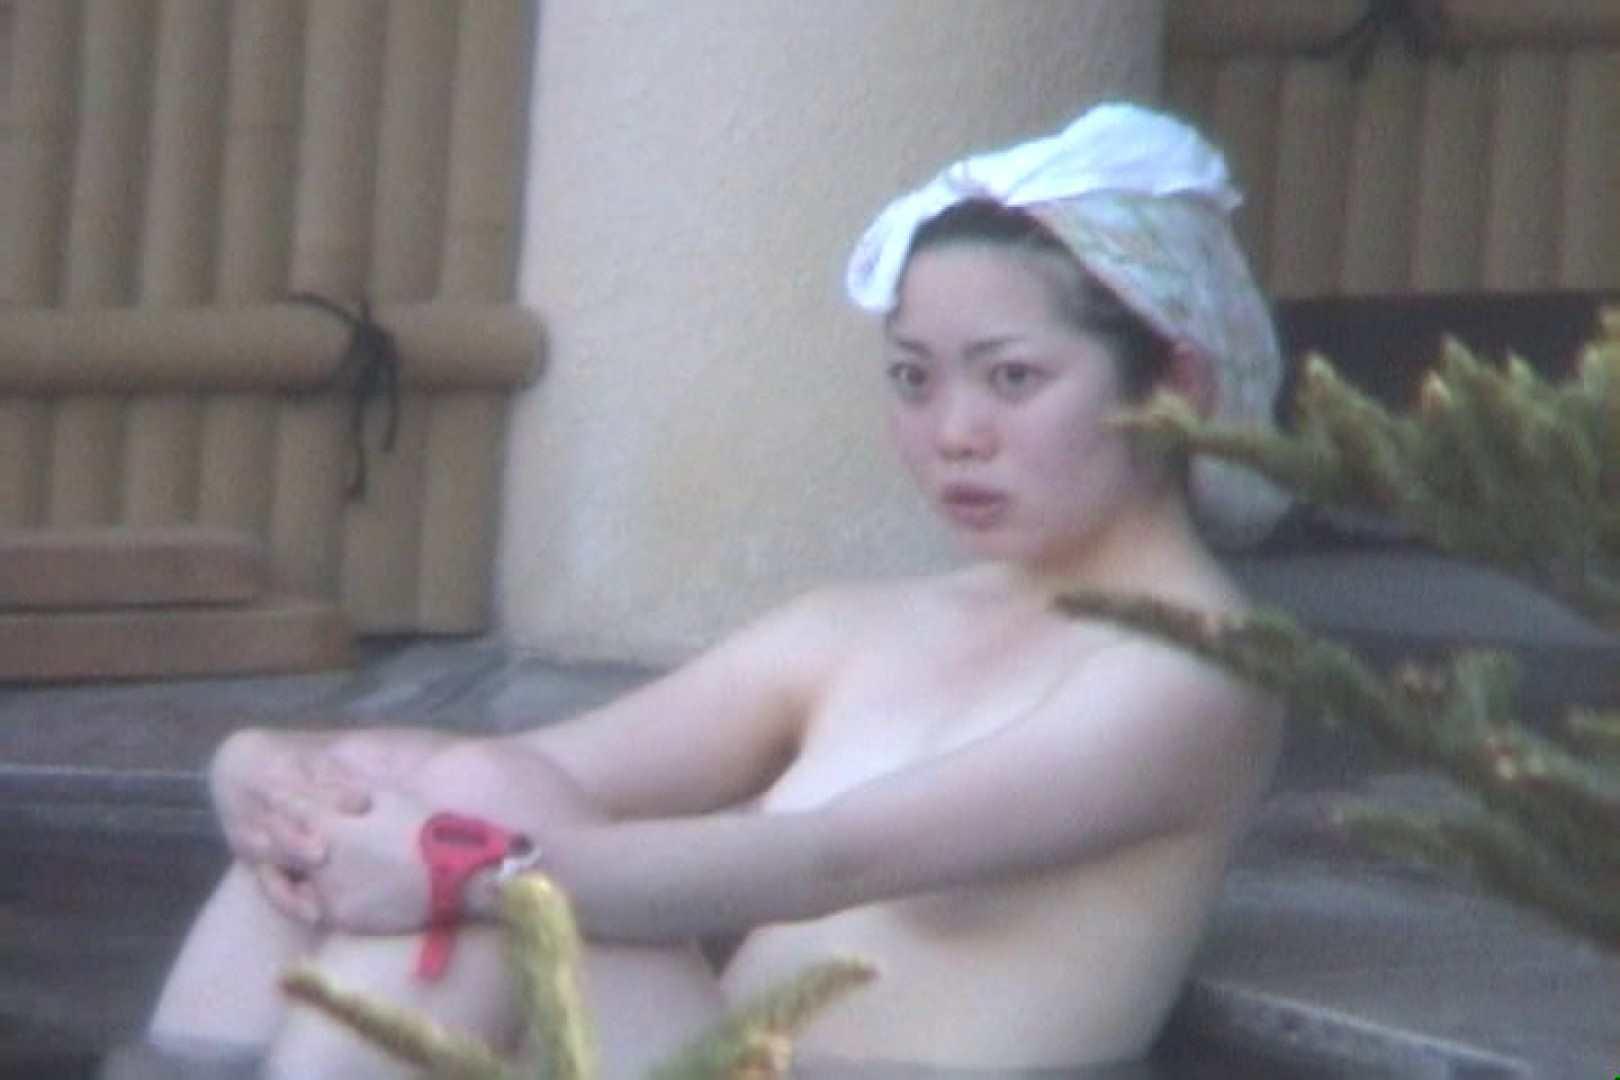 Aquaな露天風呂Vol.86【VIP限定】 OLのエロ生活 オマンコ無修正動画無料 96連発 86